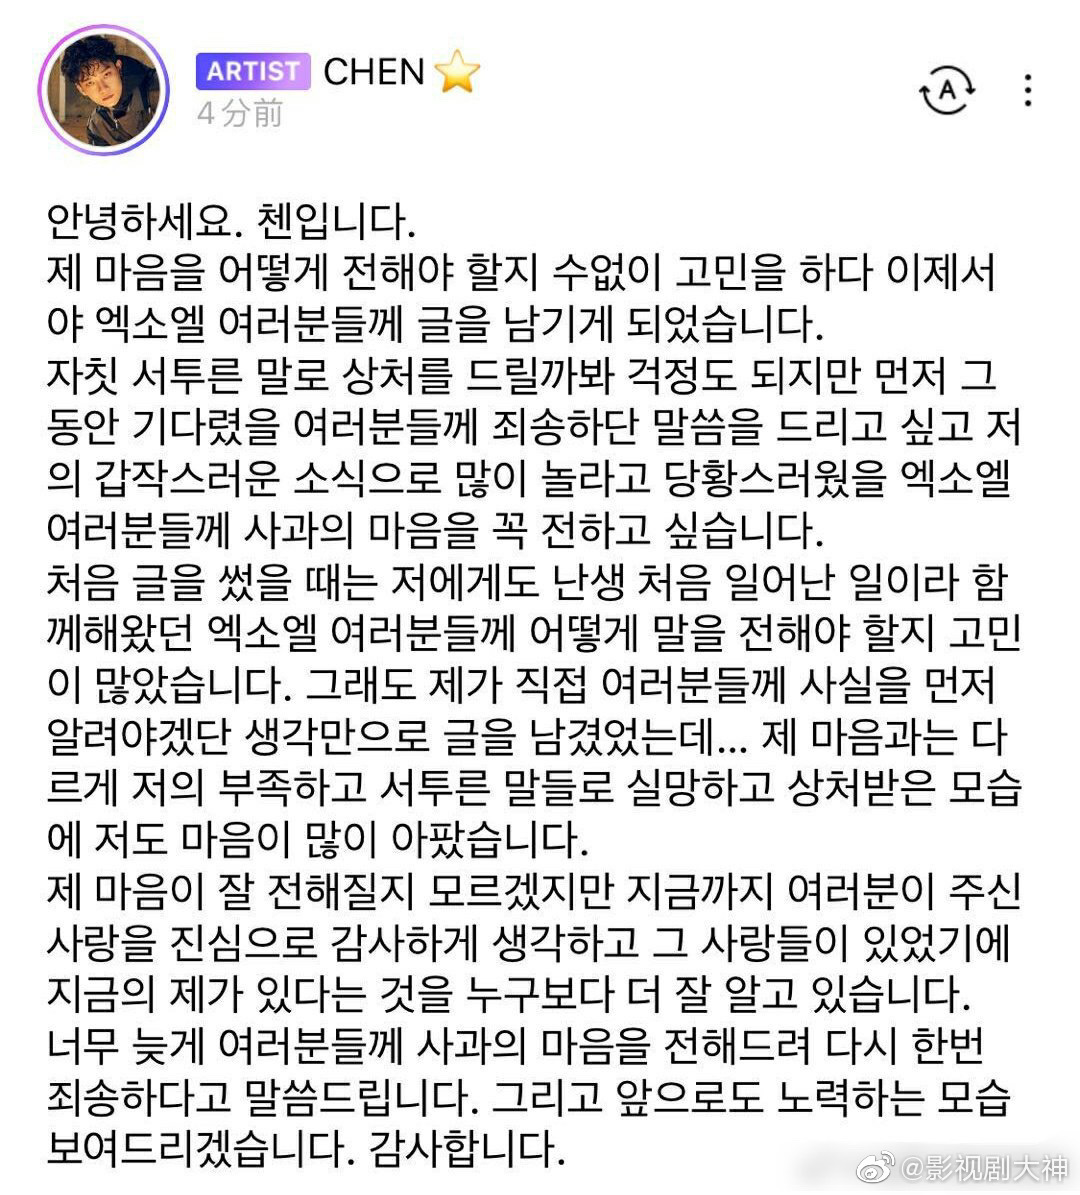 EXO成员金钟大发文为突然宣布结婚一事道歉